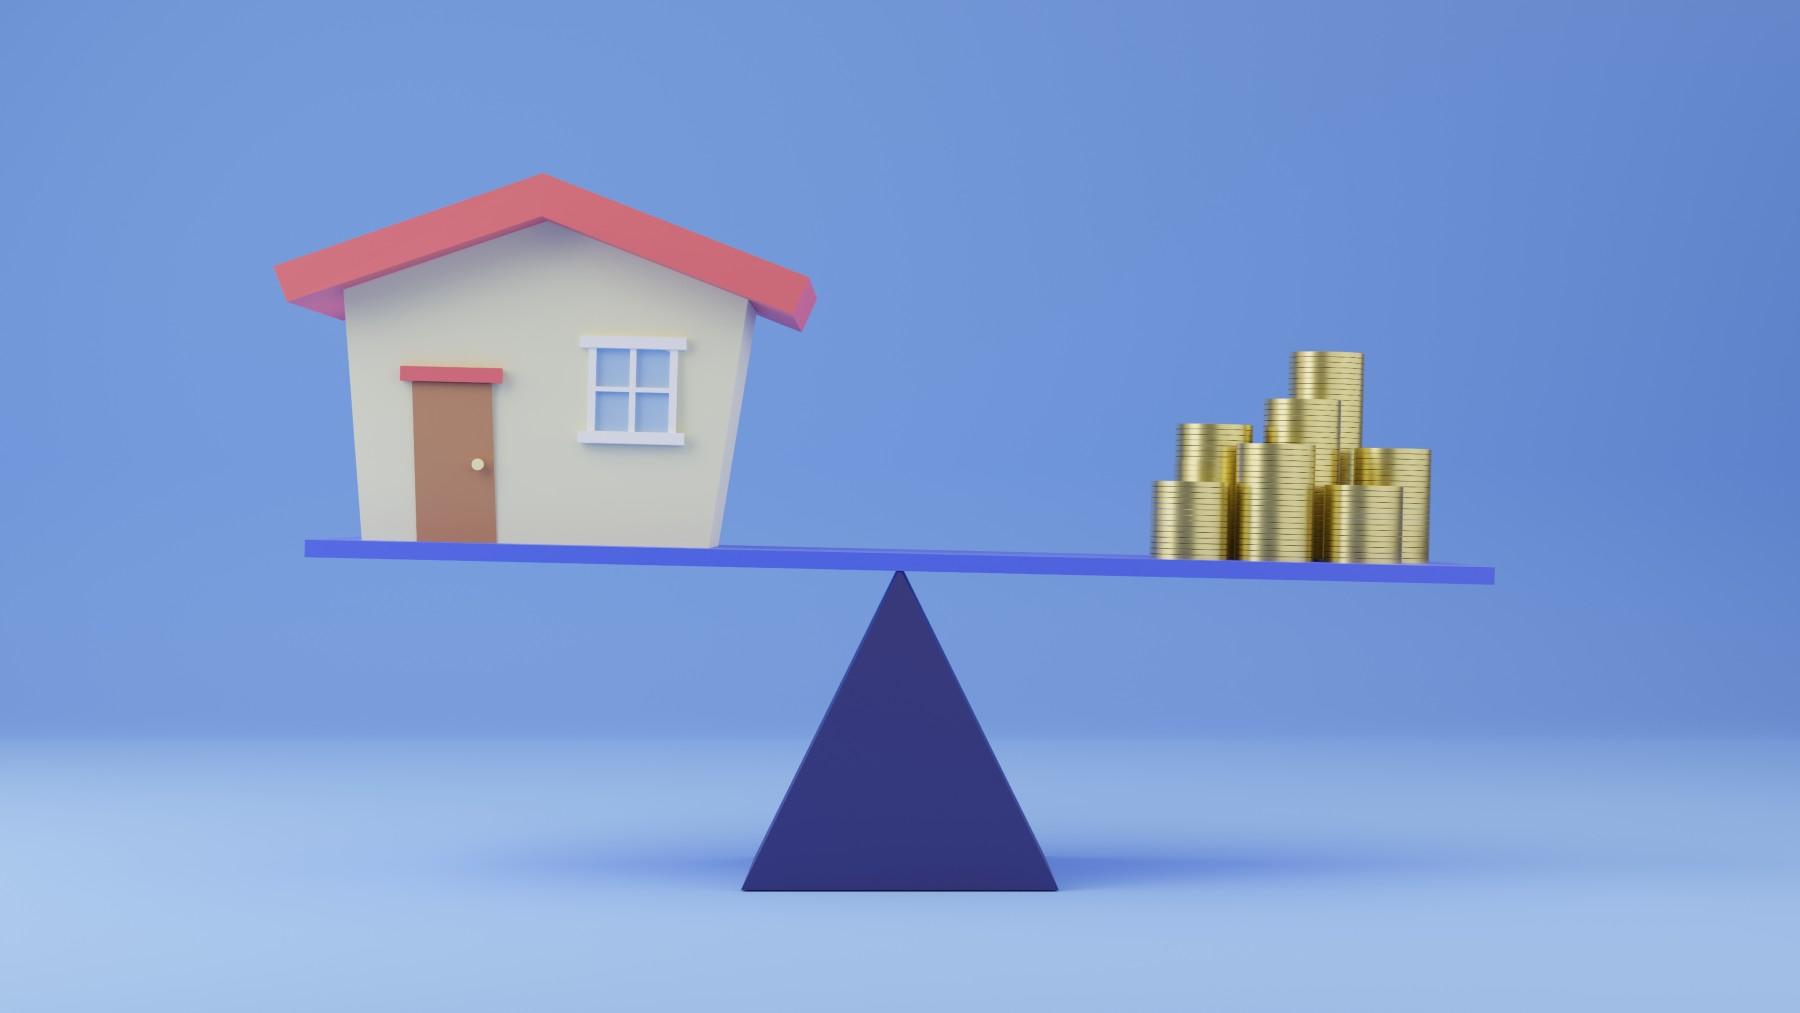 Balancing house and money